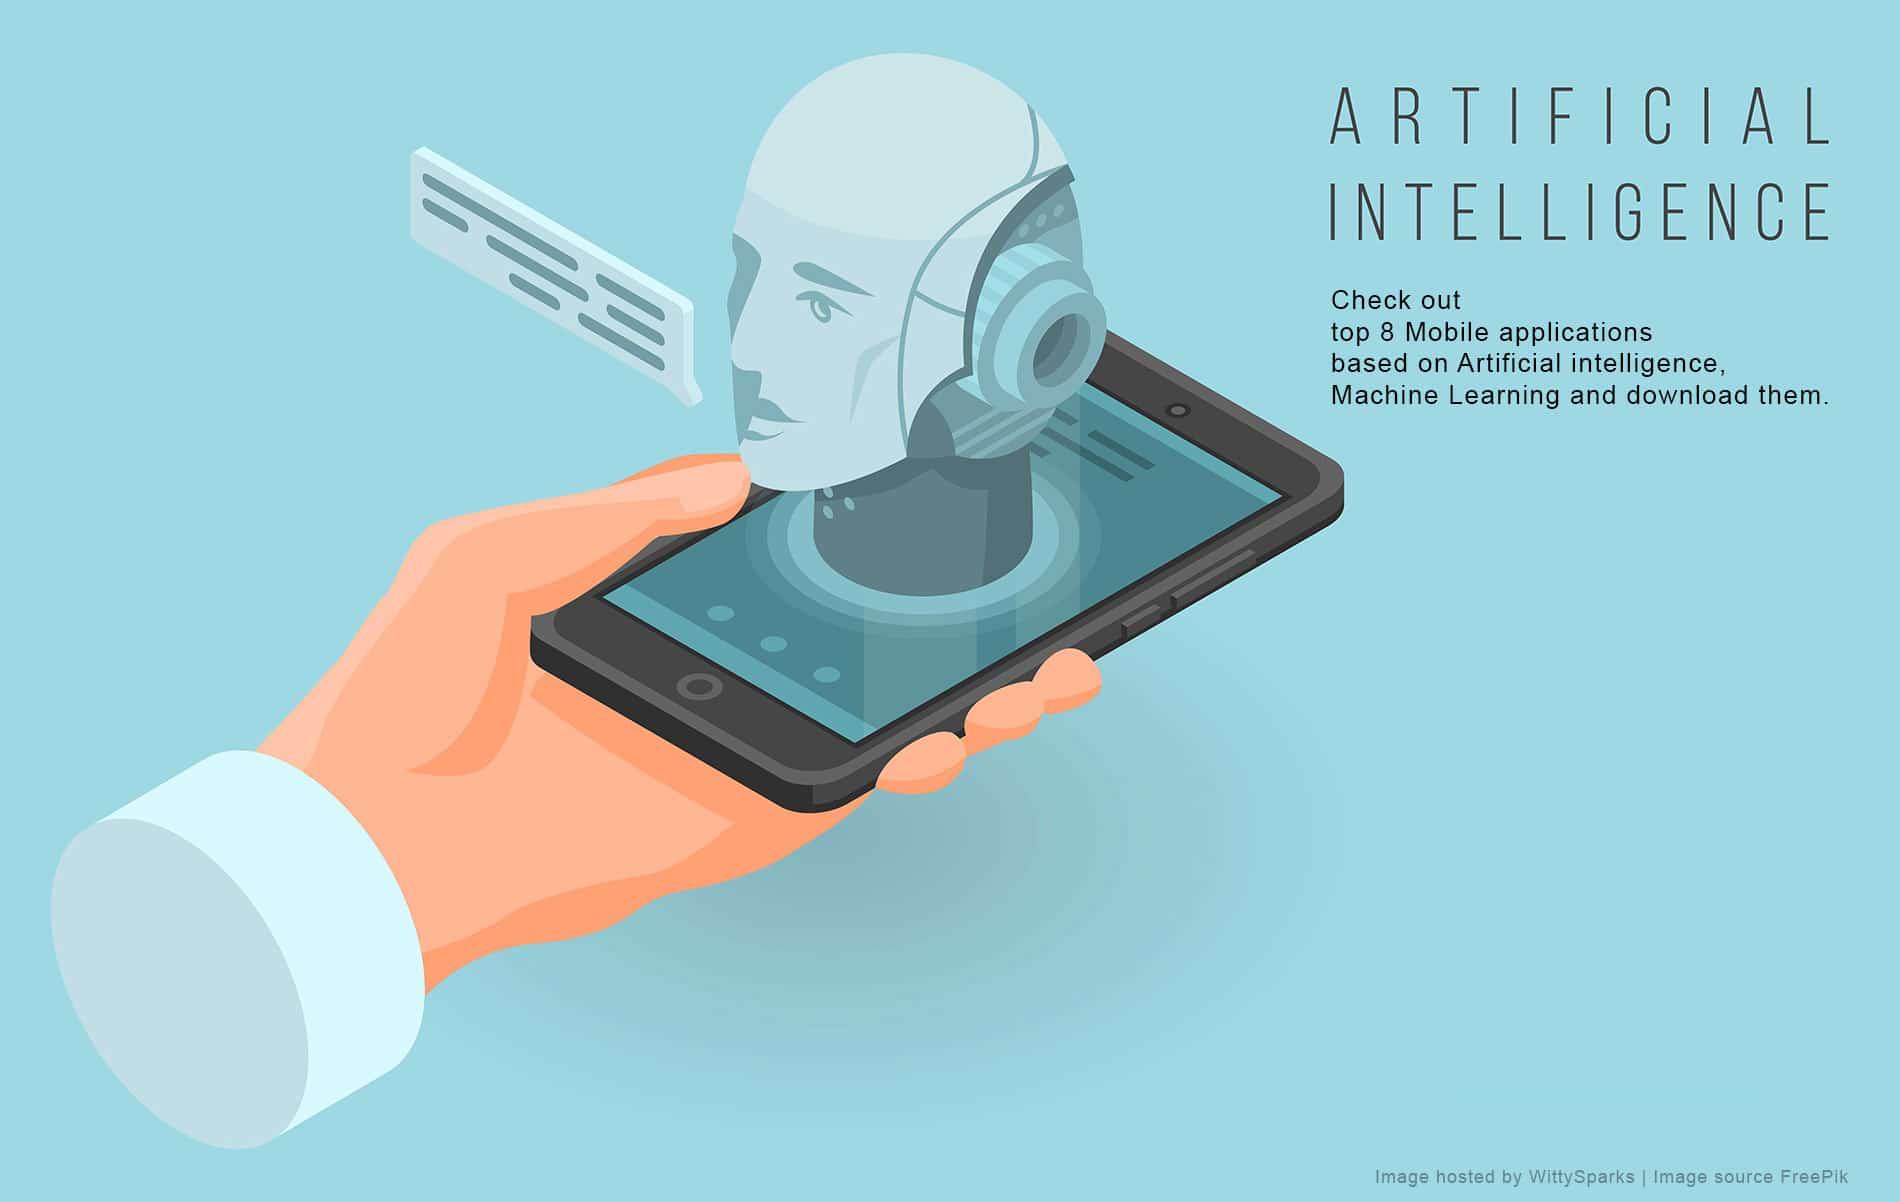 Mobile app developers optimizing AI